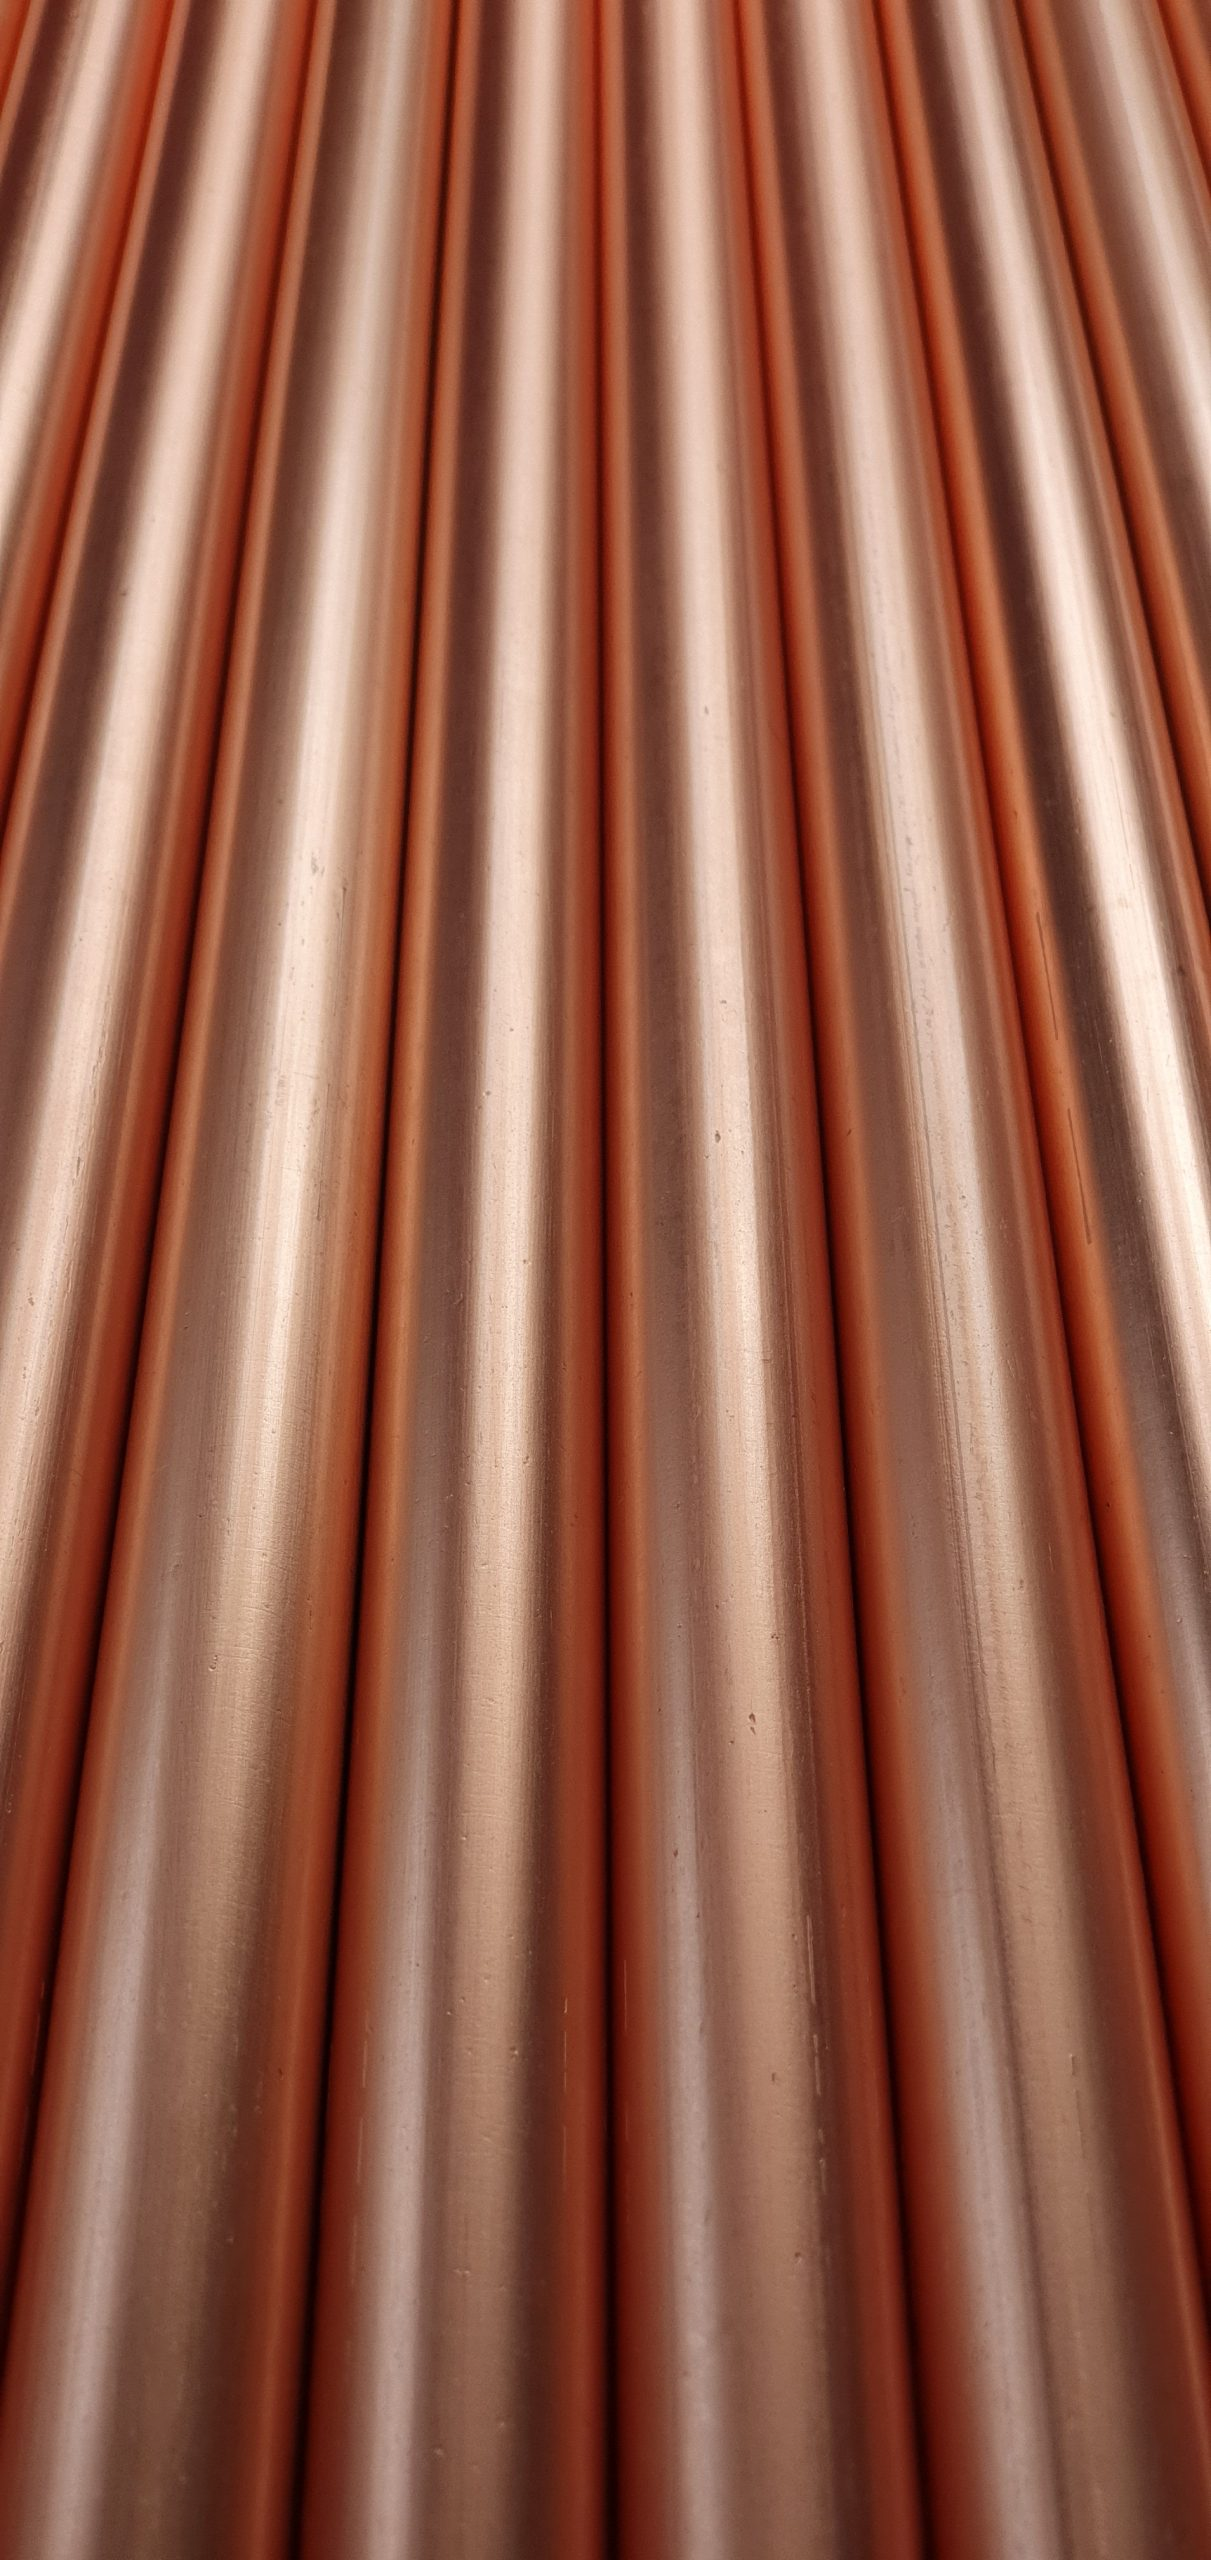 Copper conduit lighting